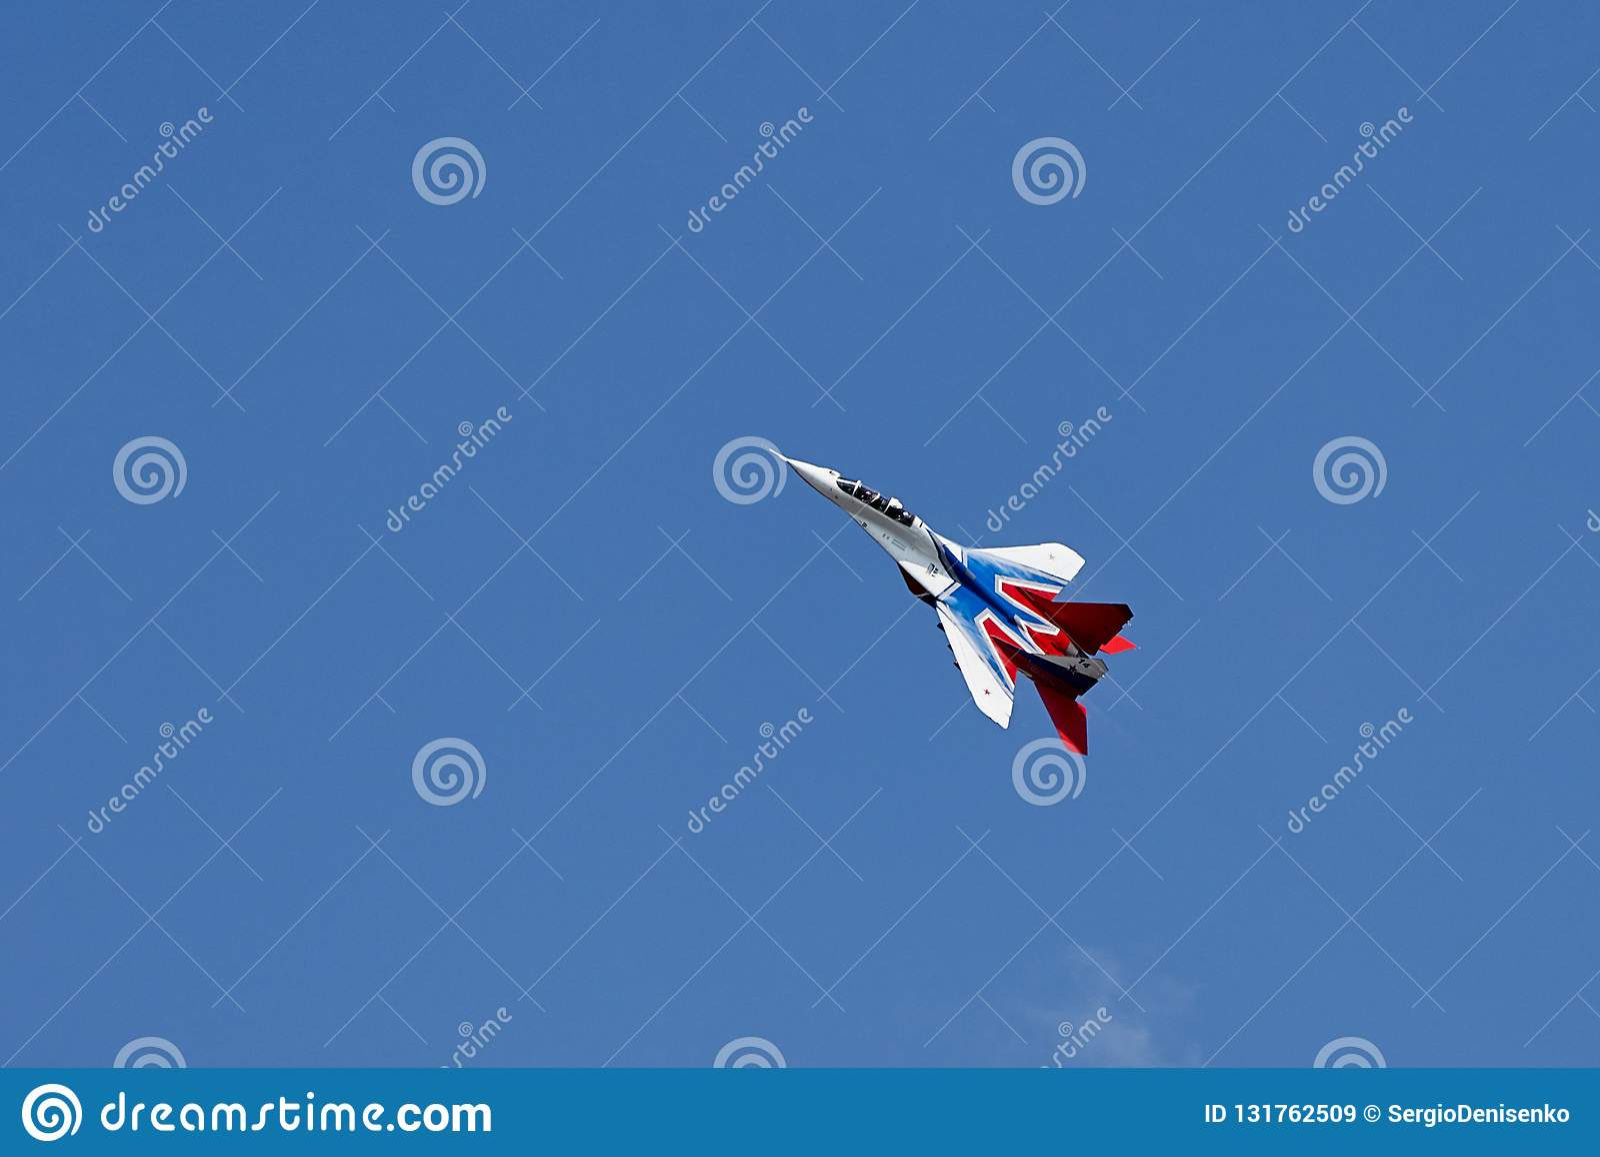 Singole acrobazie aeree degli aerei MiG-29 sul chiaro cielo blu di Gelendzhik